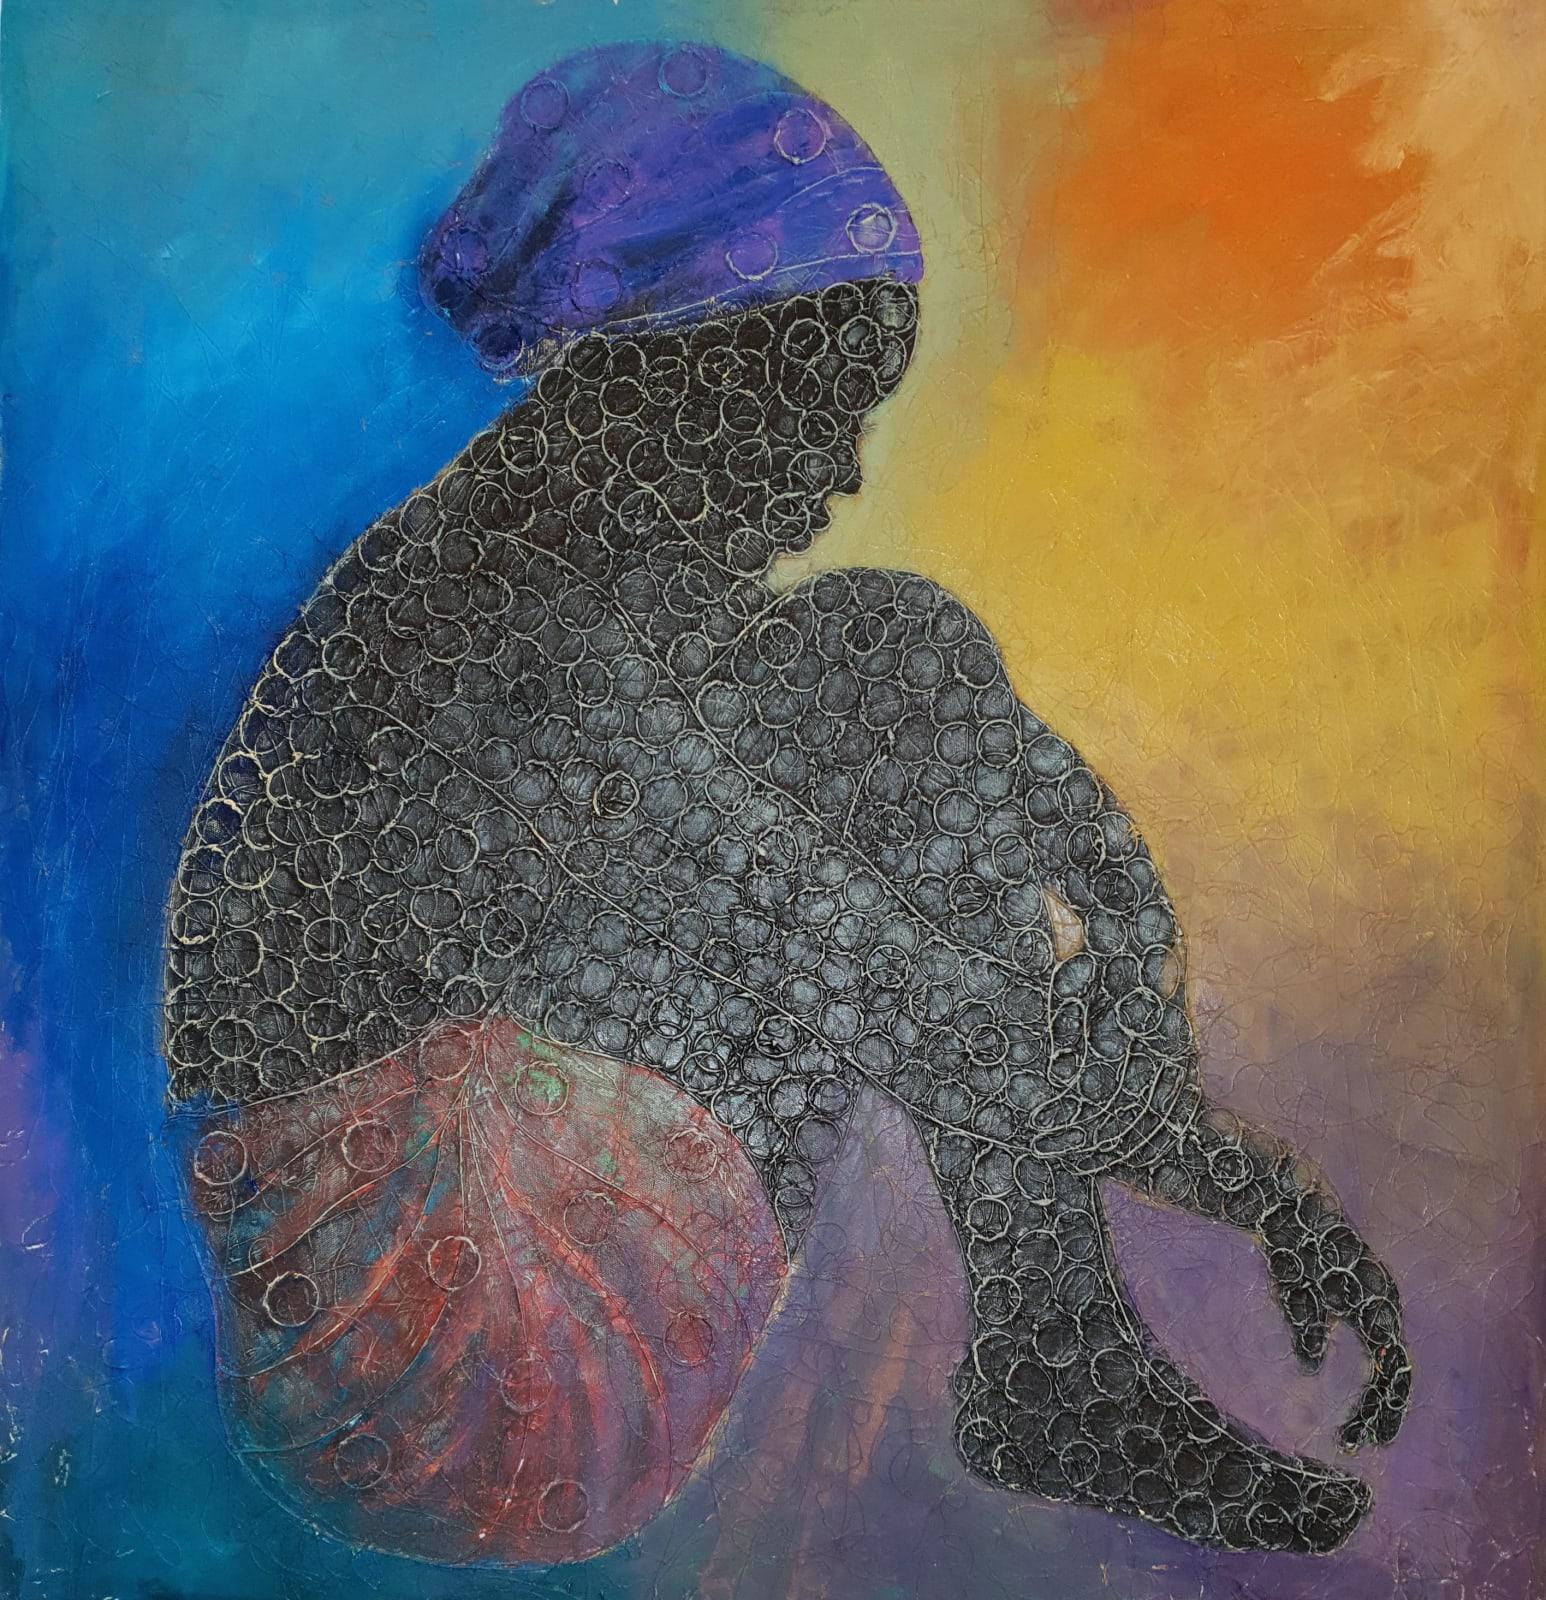 Uchay Chima, Yesterday Is Gone, 2018